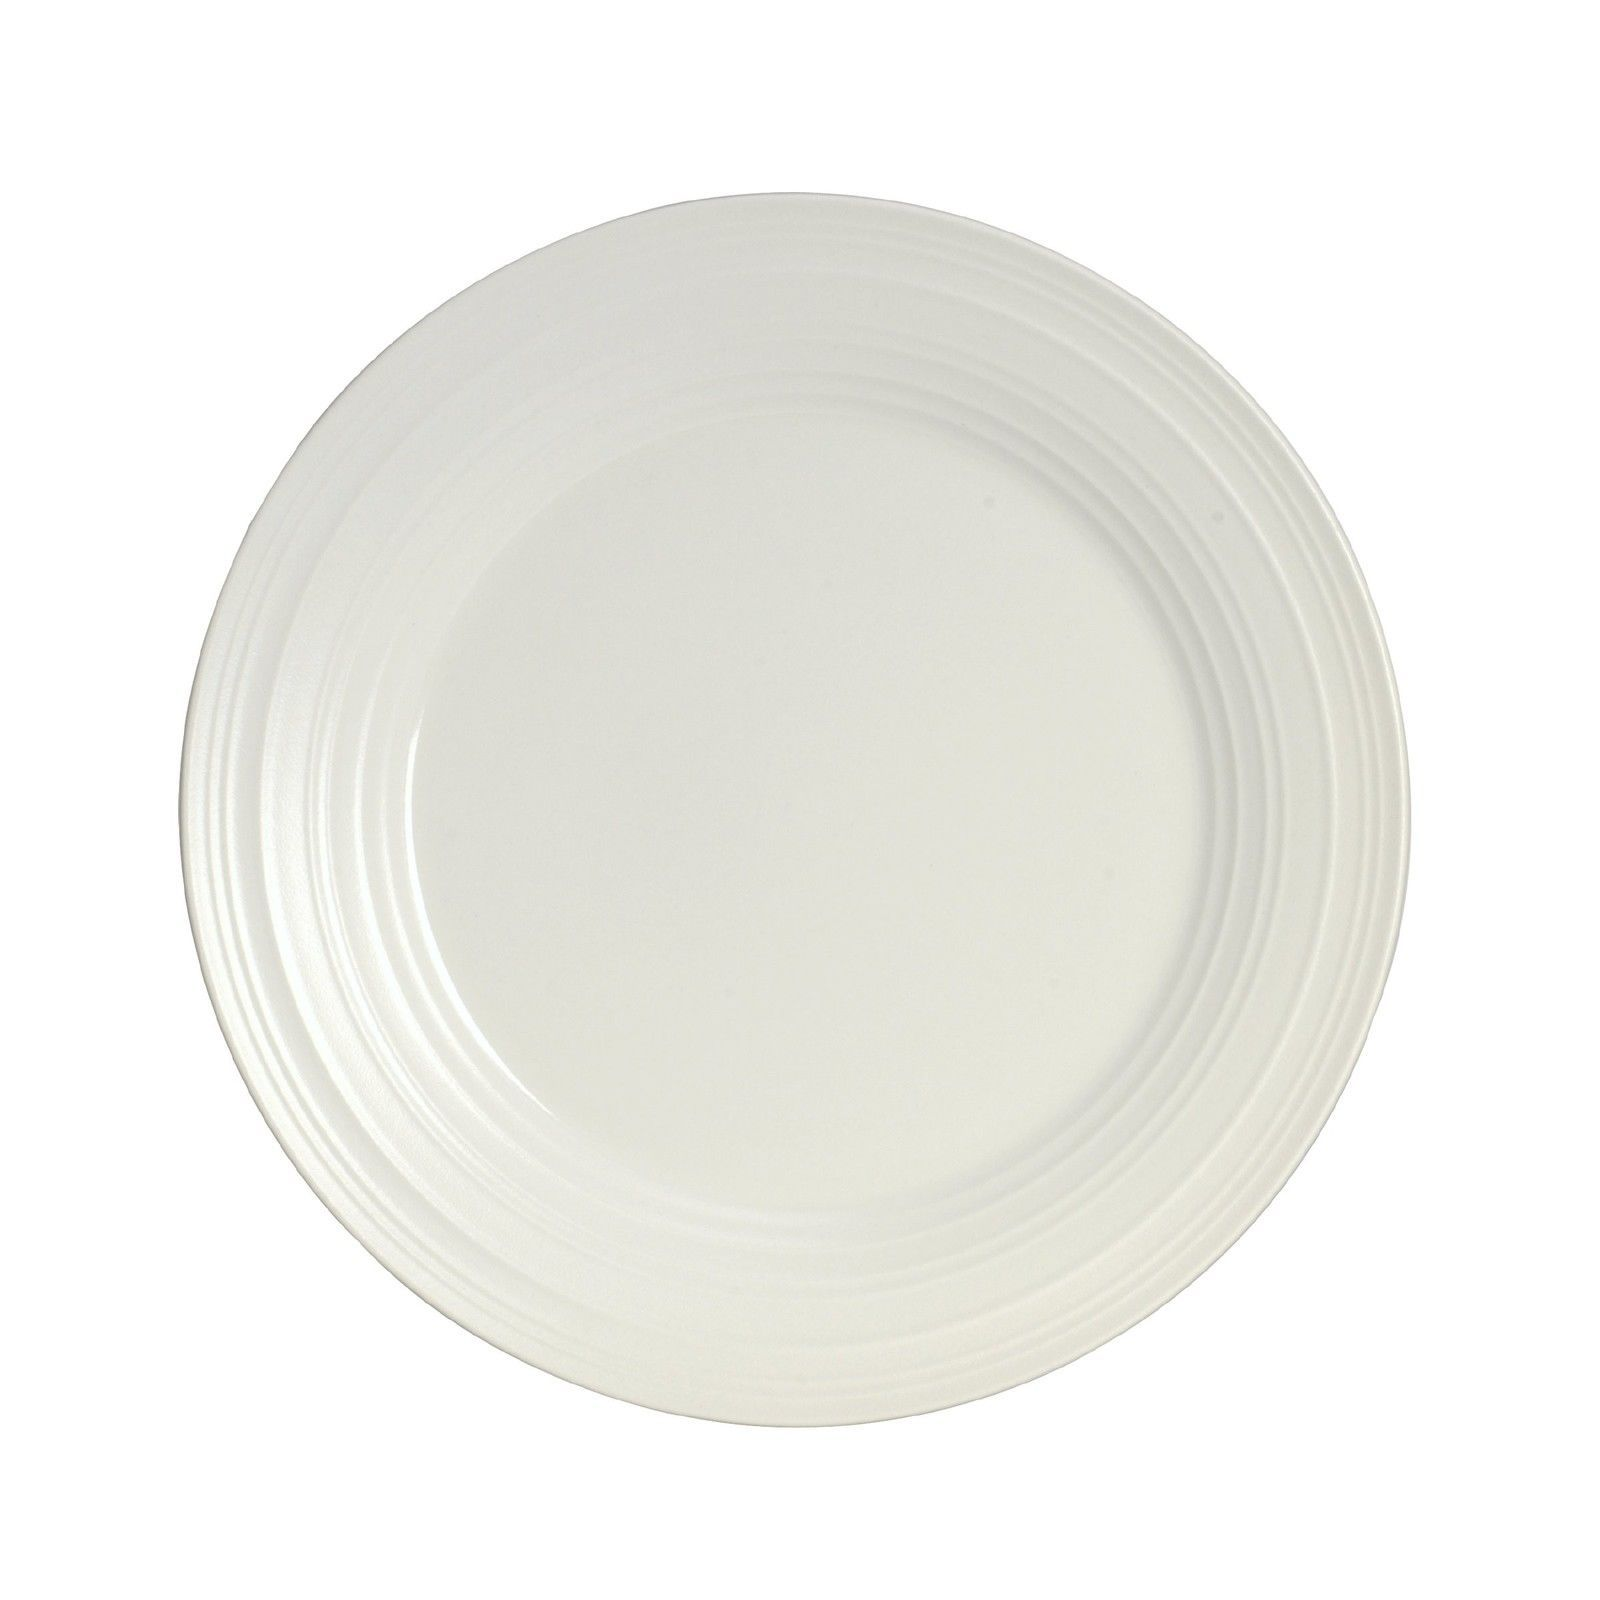 Mikasa Swirl 4 Piece Dish Set White